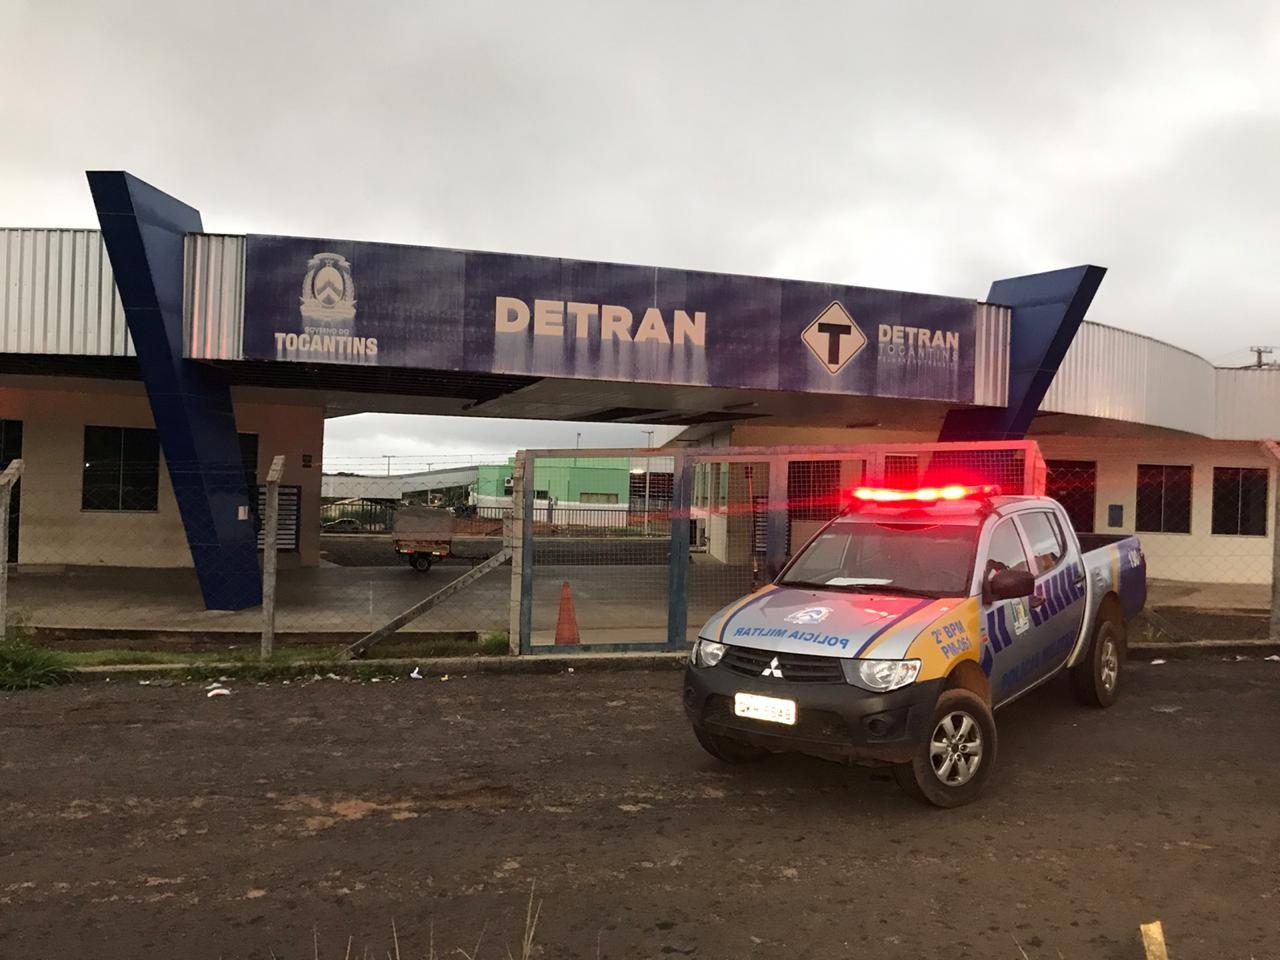 Detran suspende empresas e afasta servidores investigados por fraudar documentos de veículos roubados